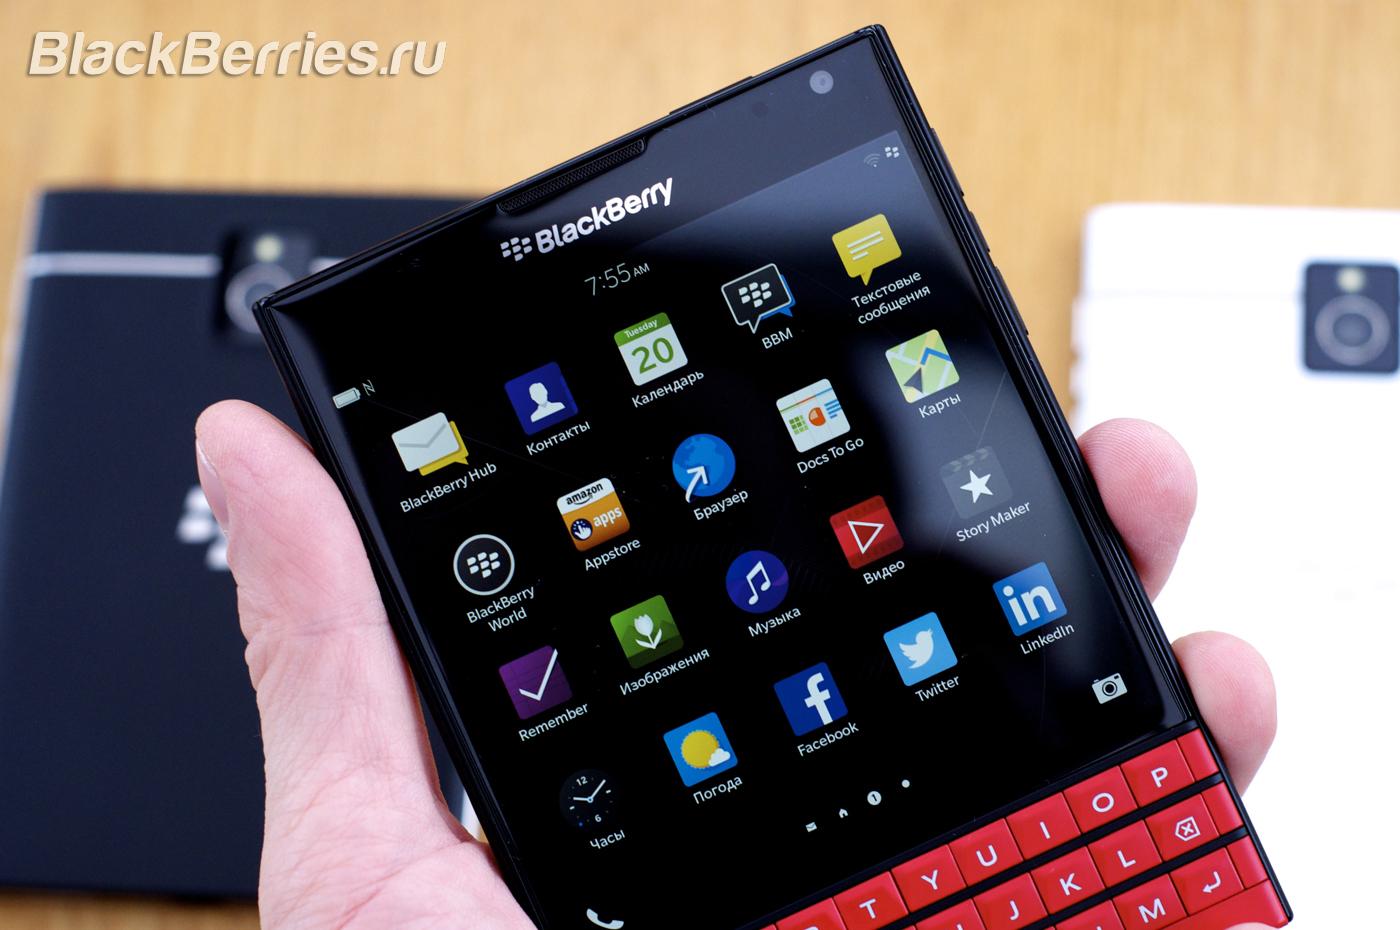 BlackBerry-Passport-Red-06